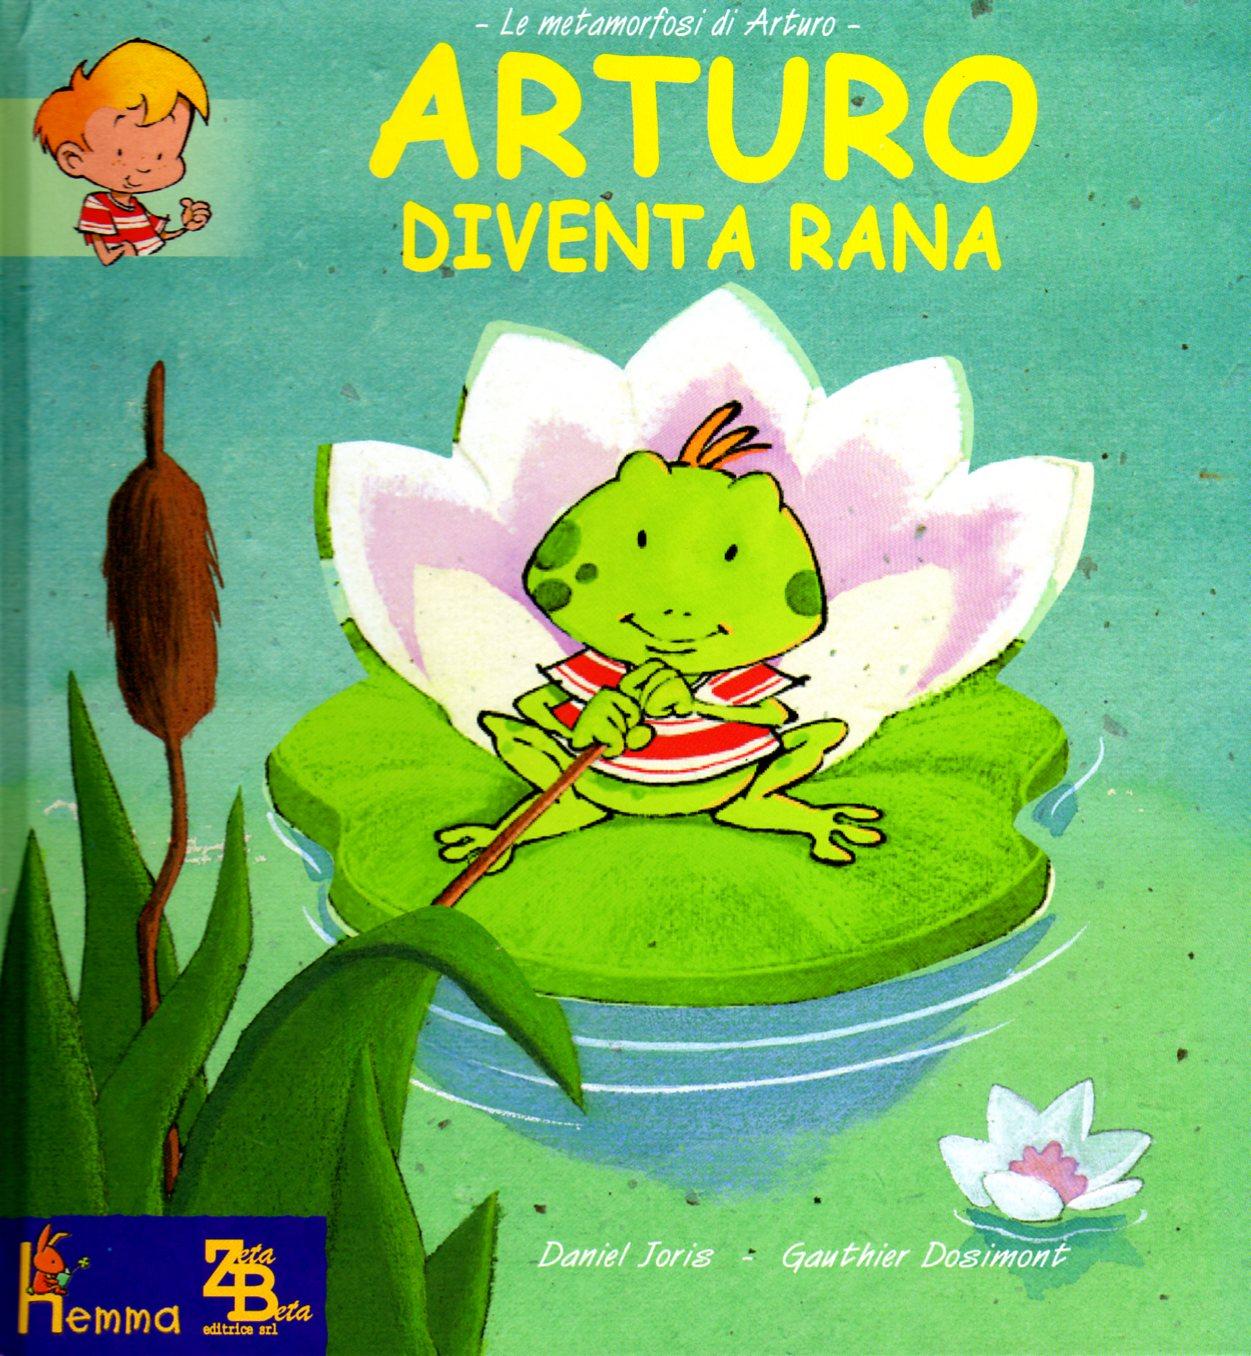 Arturo diventa rana